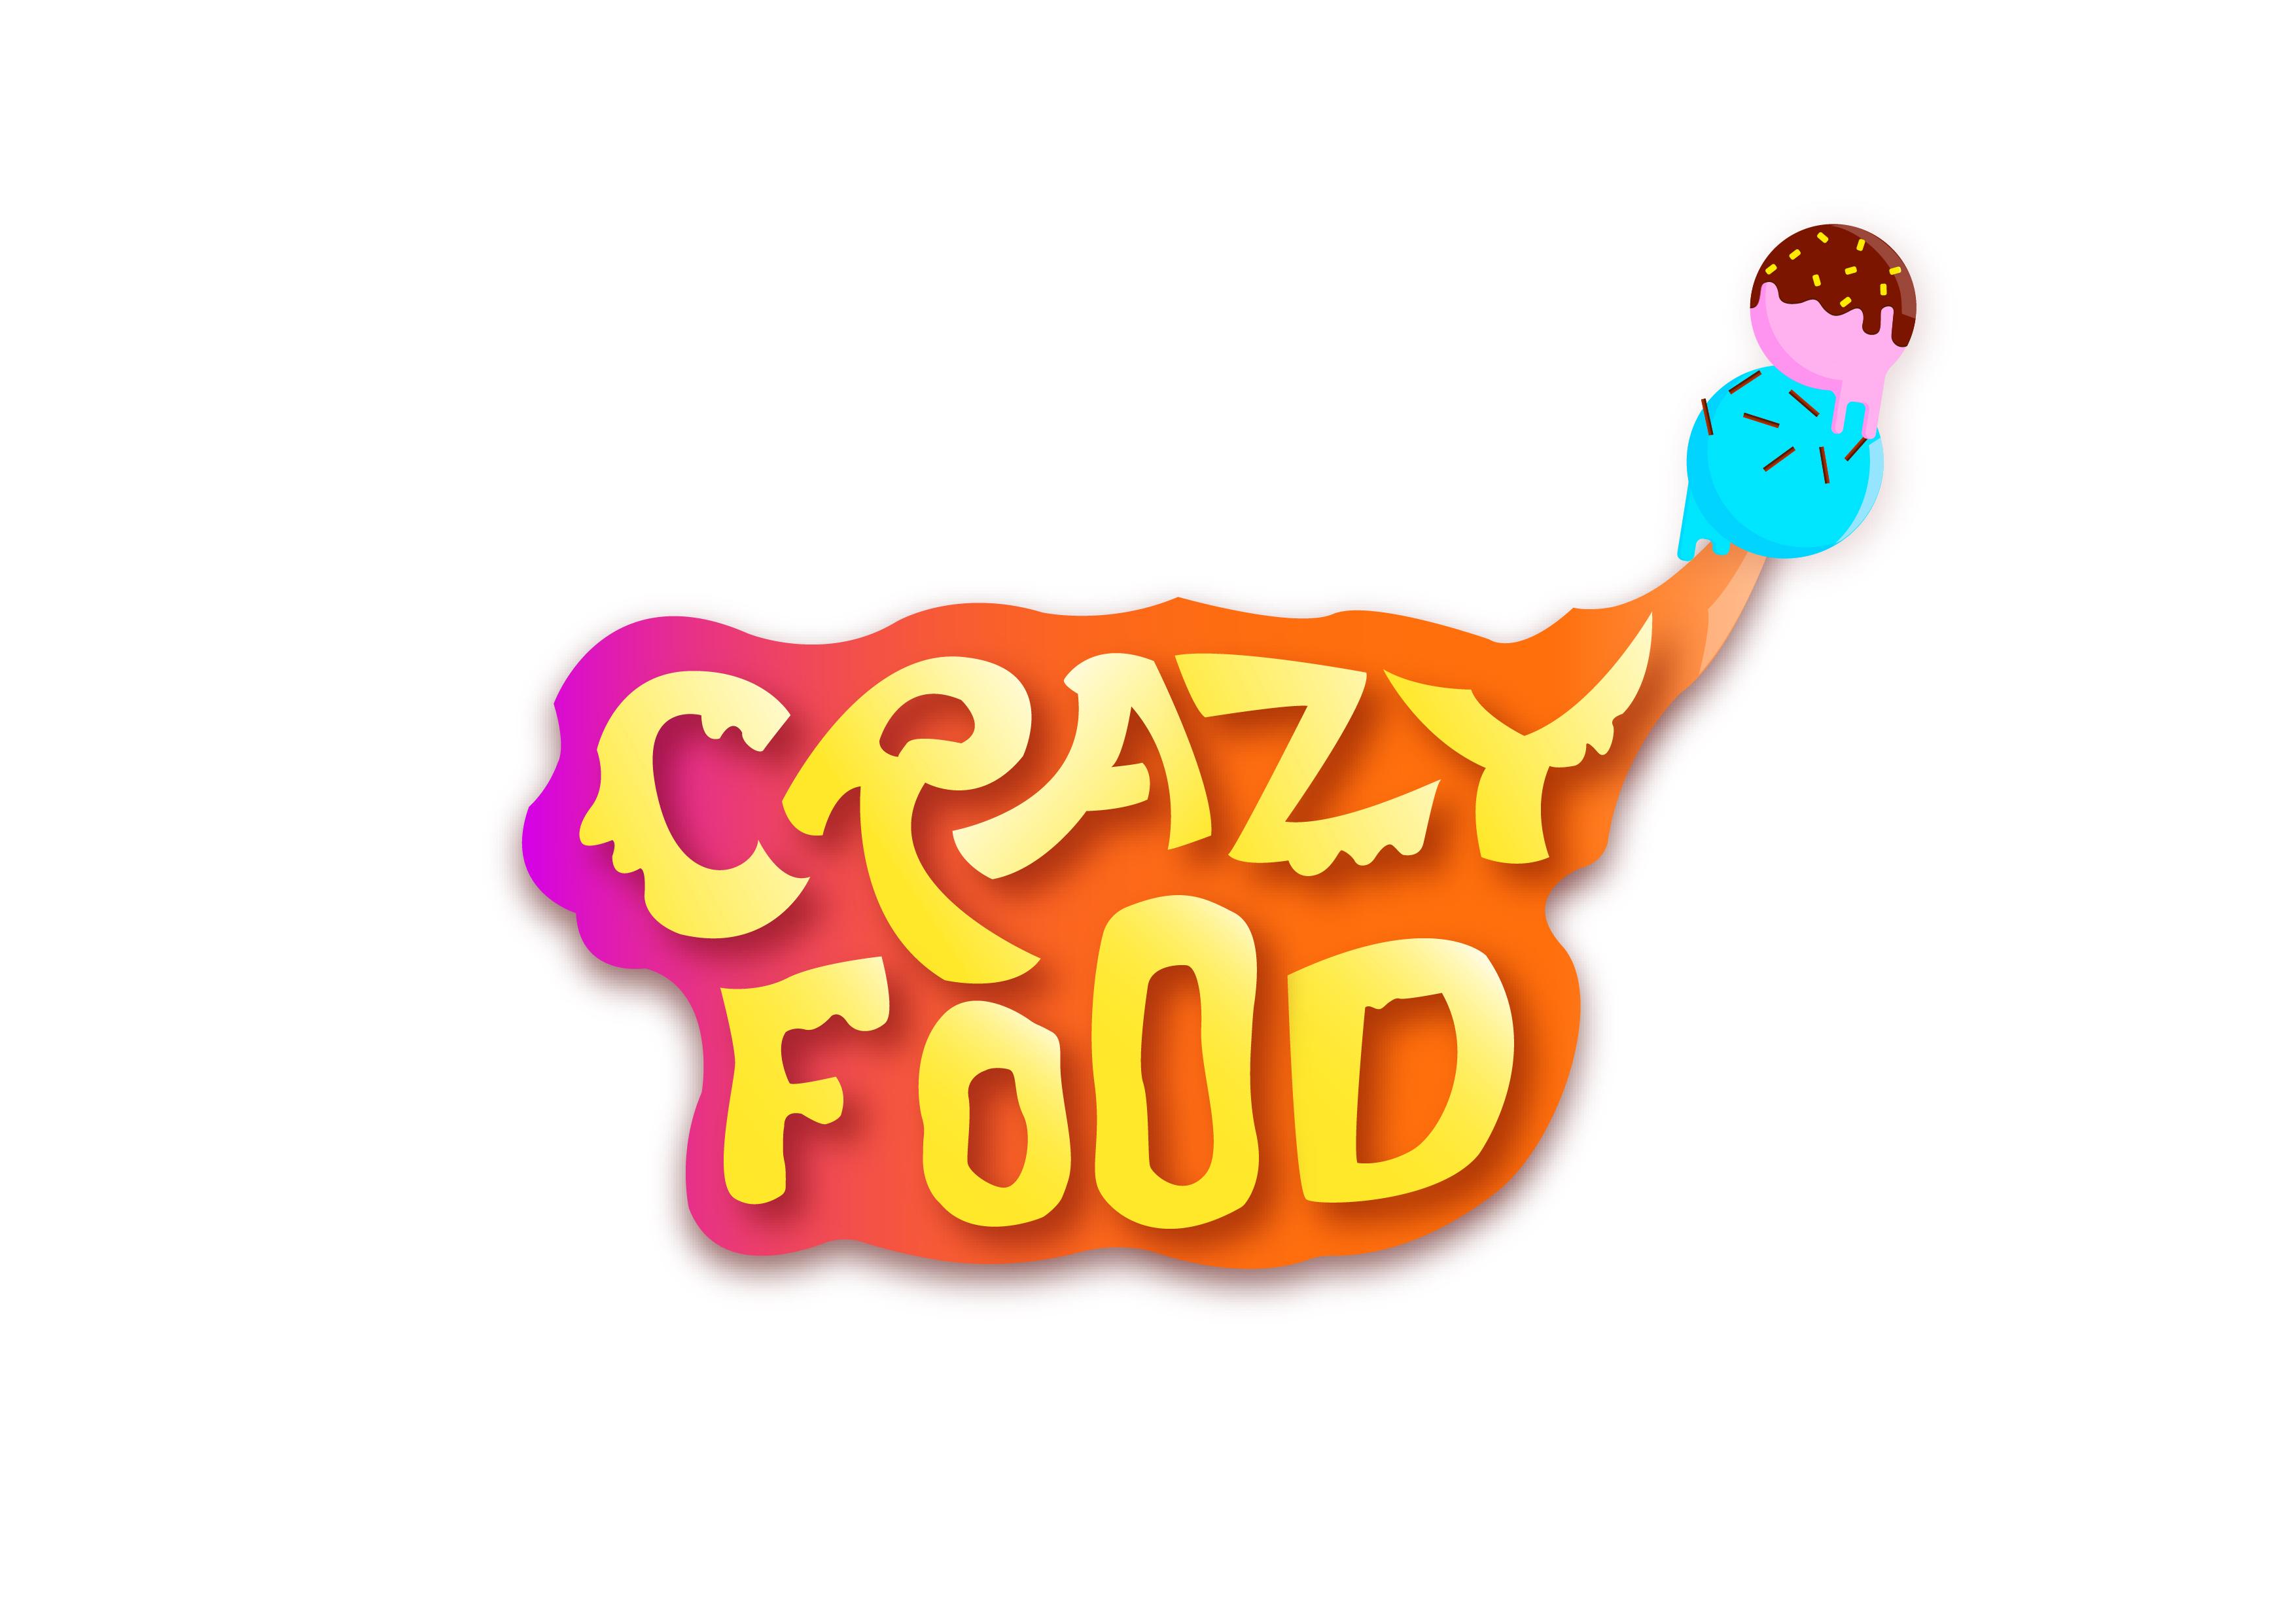 Разработать логотип и персонажа для кафе фото f_9035958d95b1751e.jpg